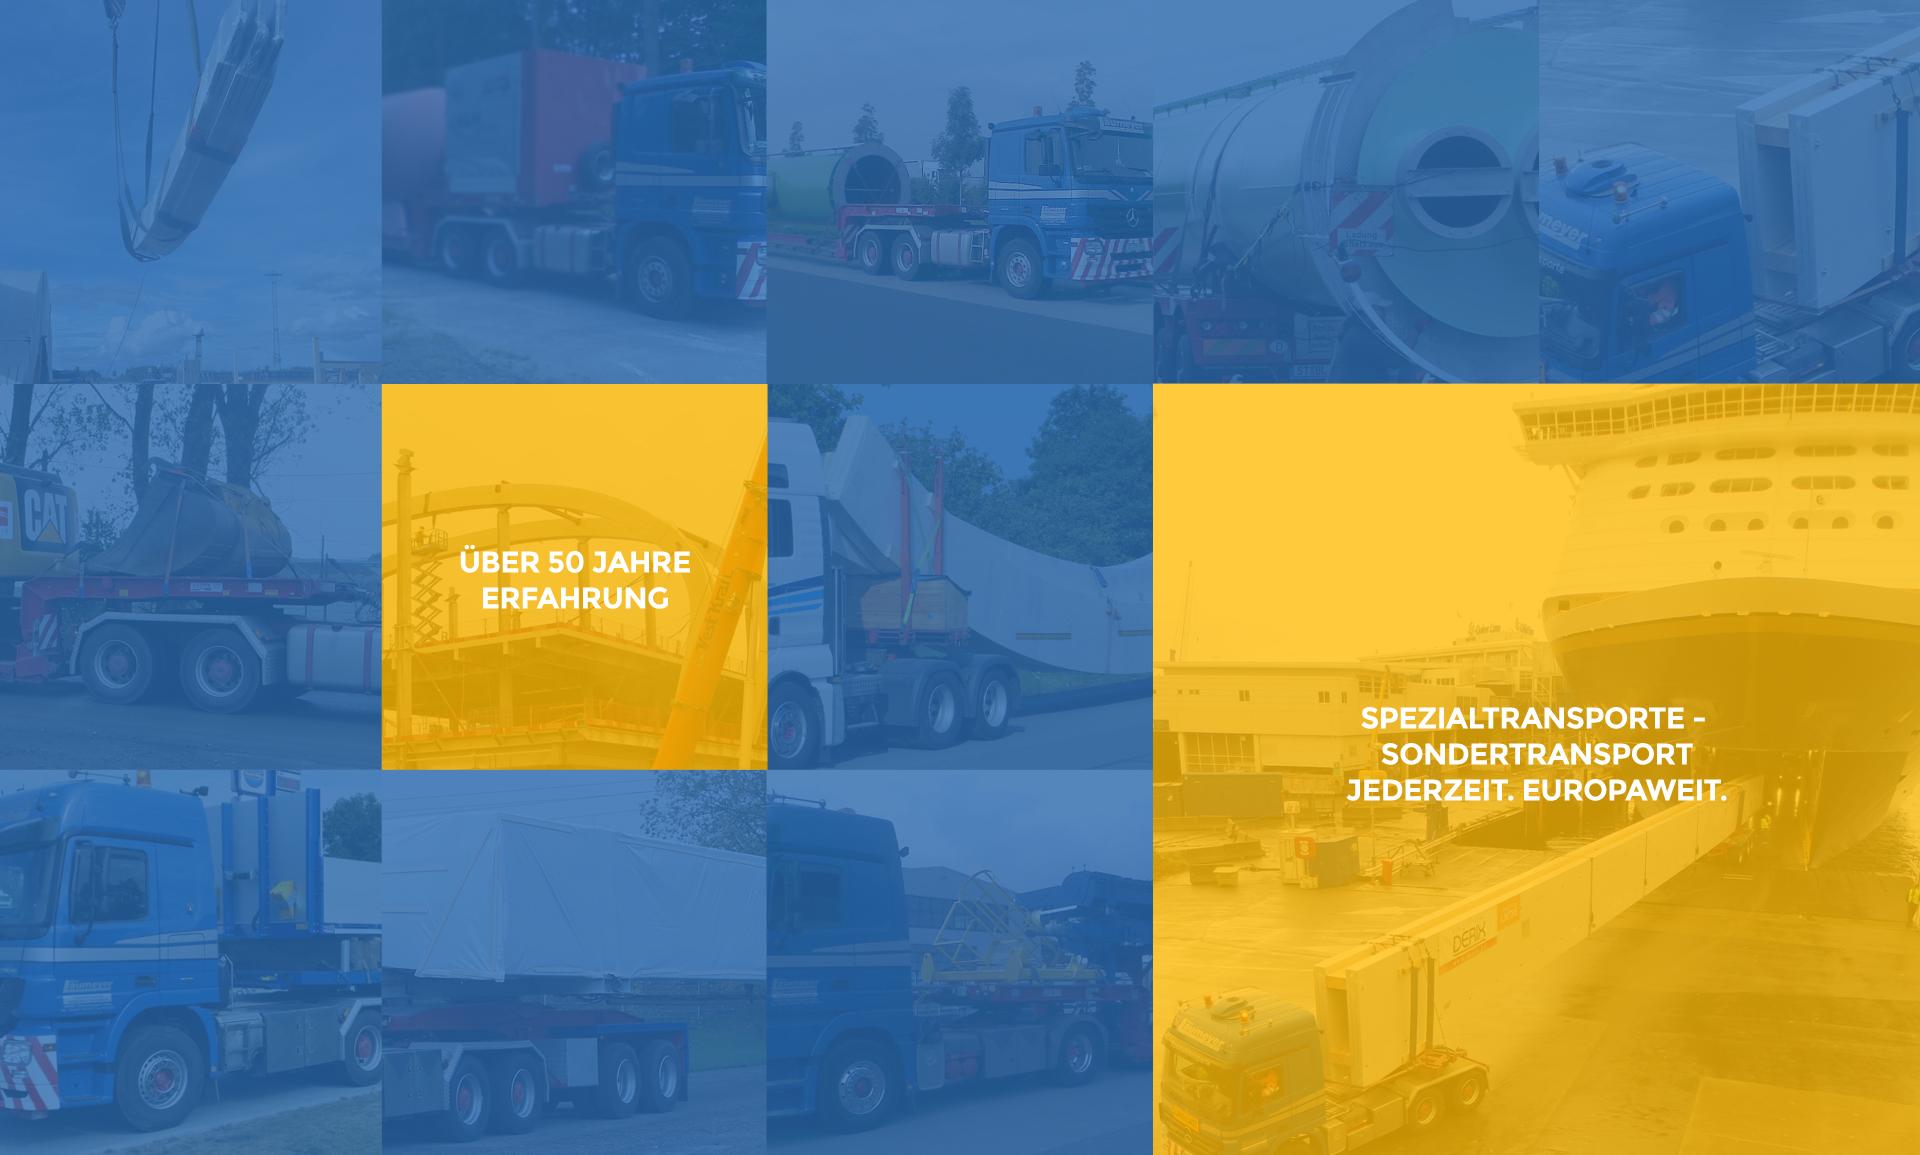 Spezialtransporte Europaweit